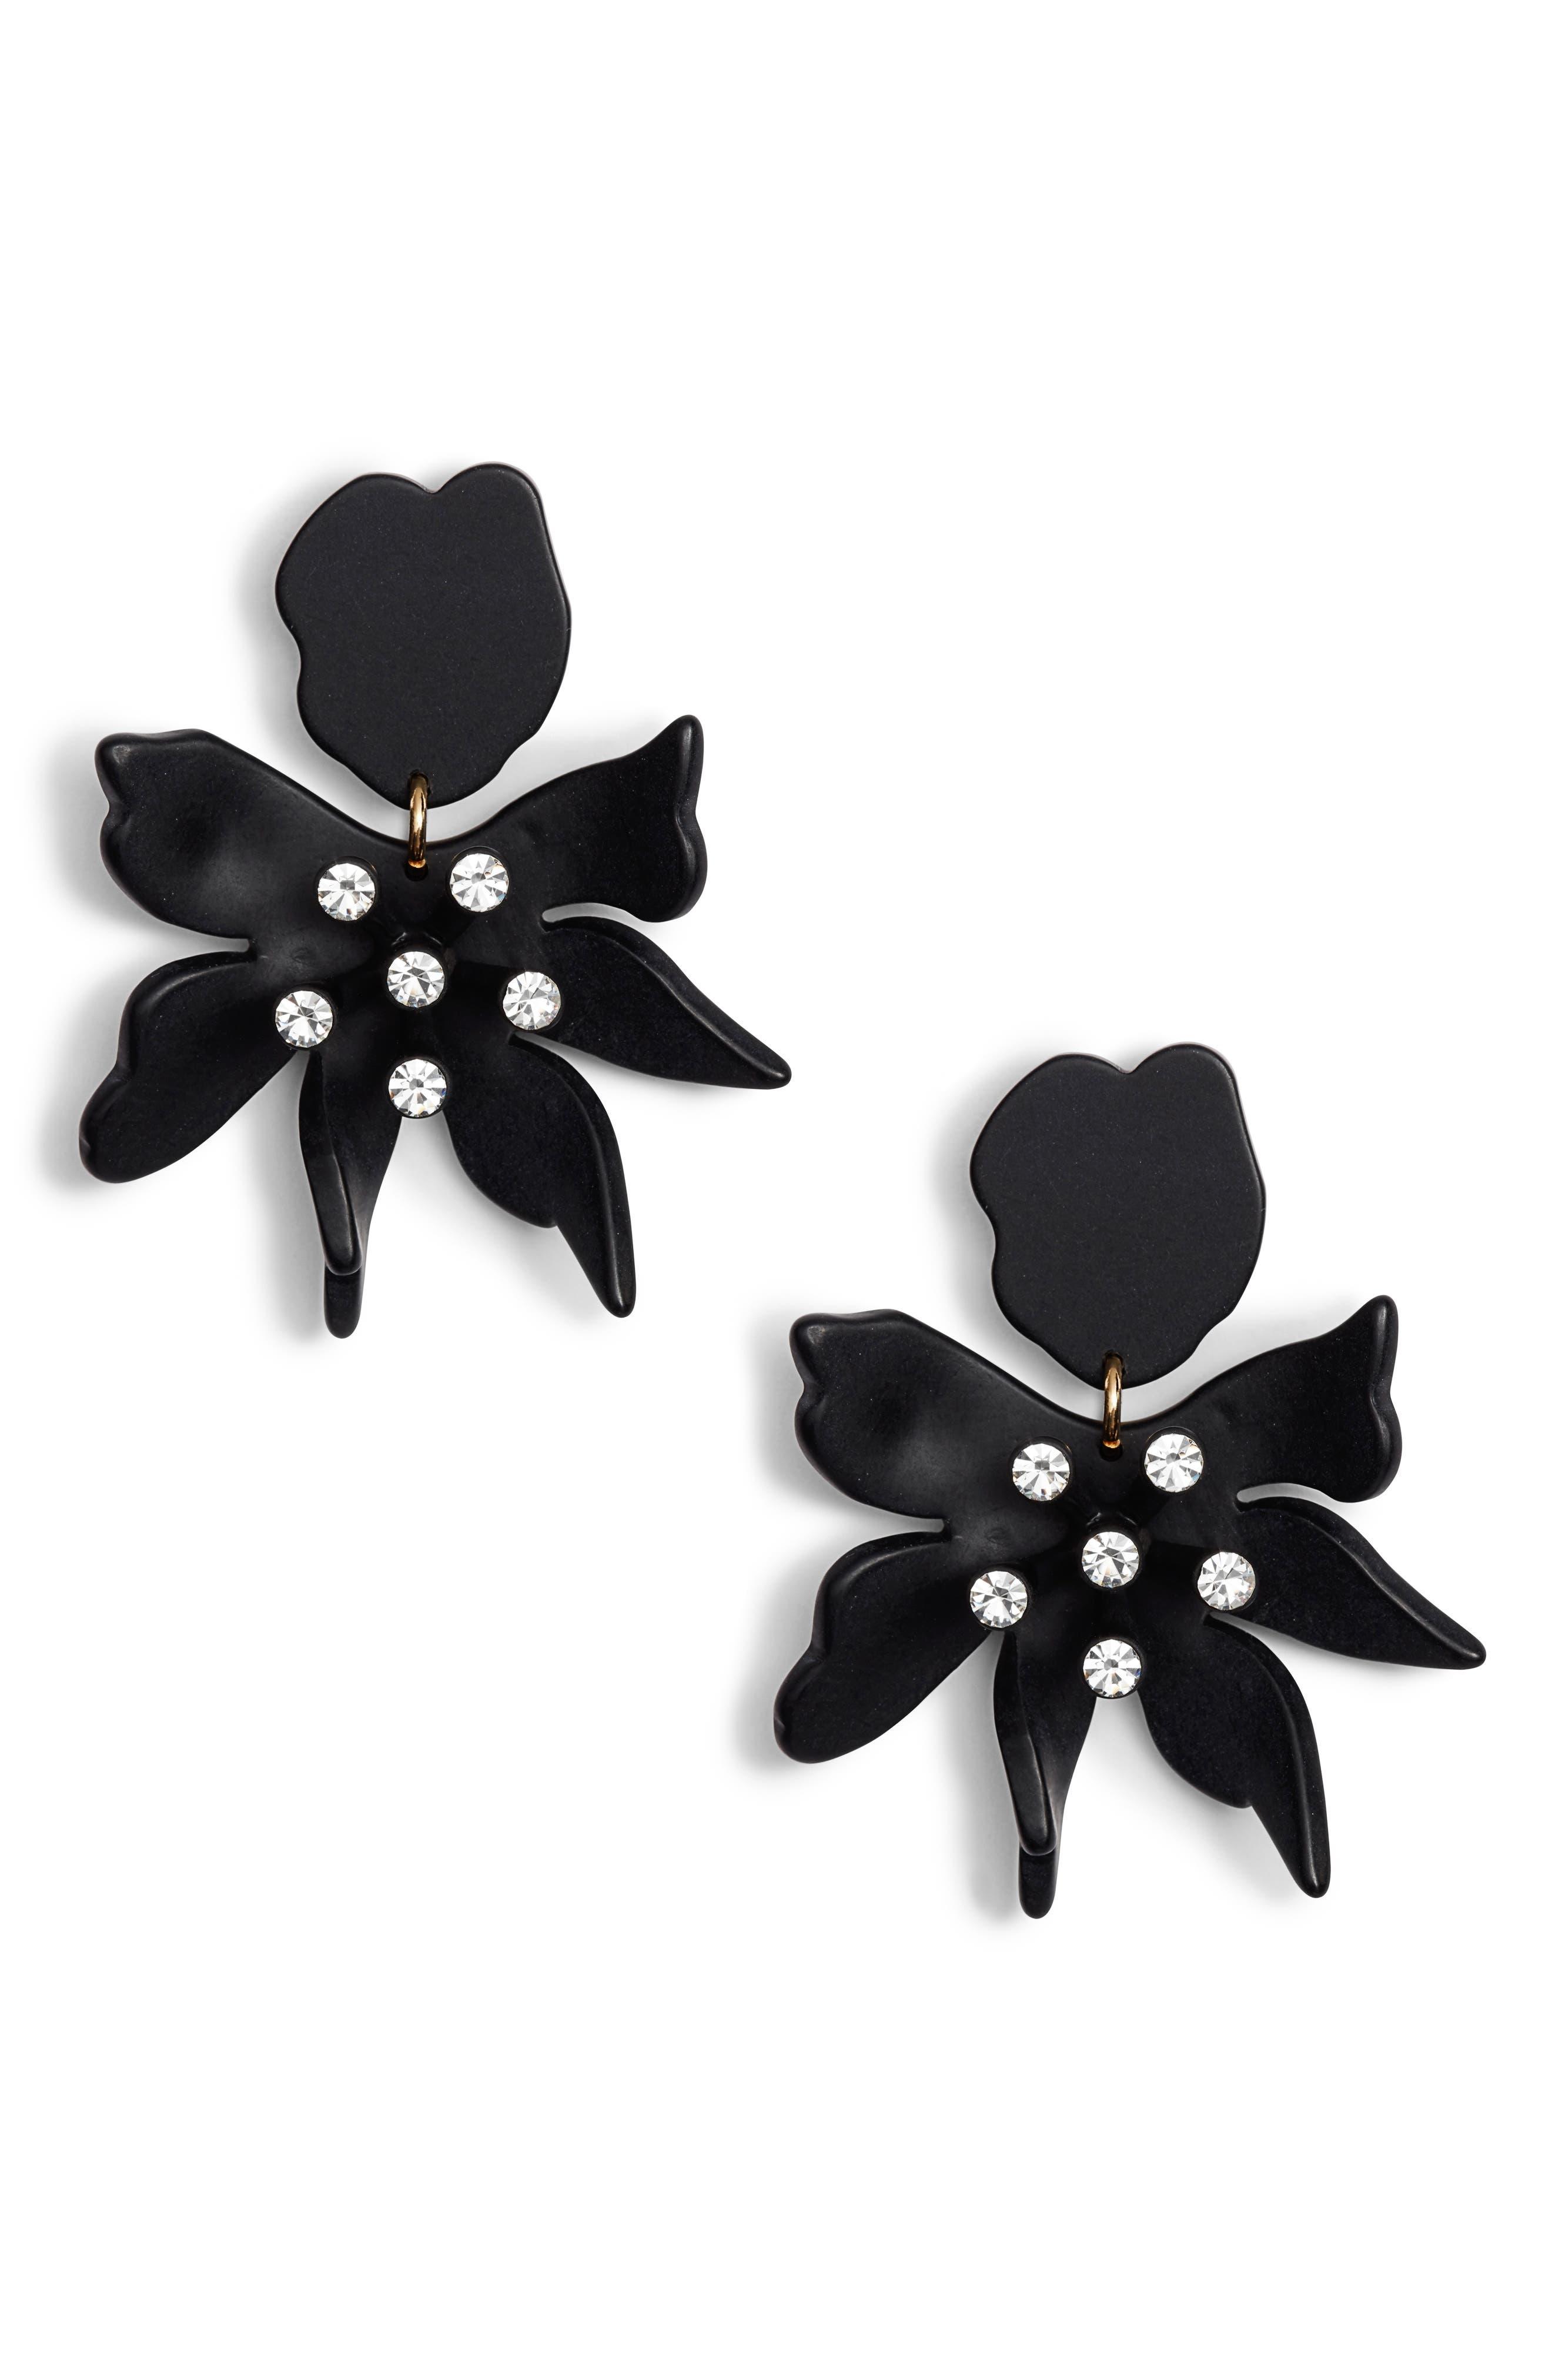 LELE SADOUGHI Daffodil Clip Drop Earrings in Jet